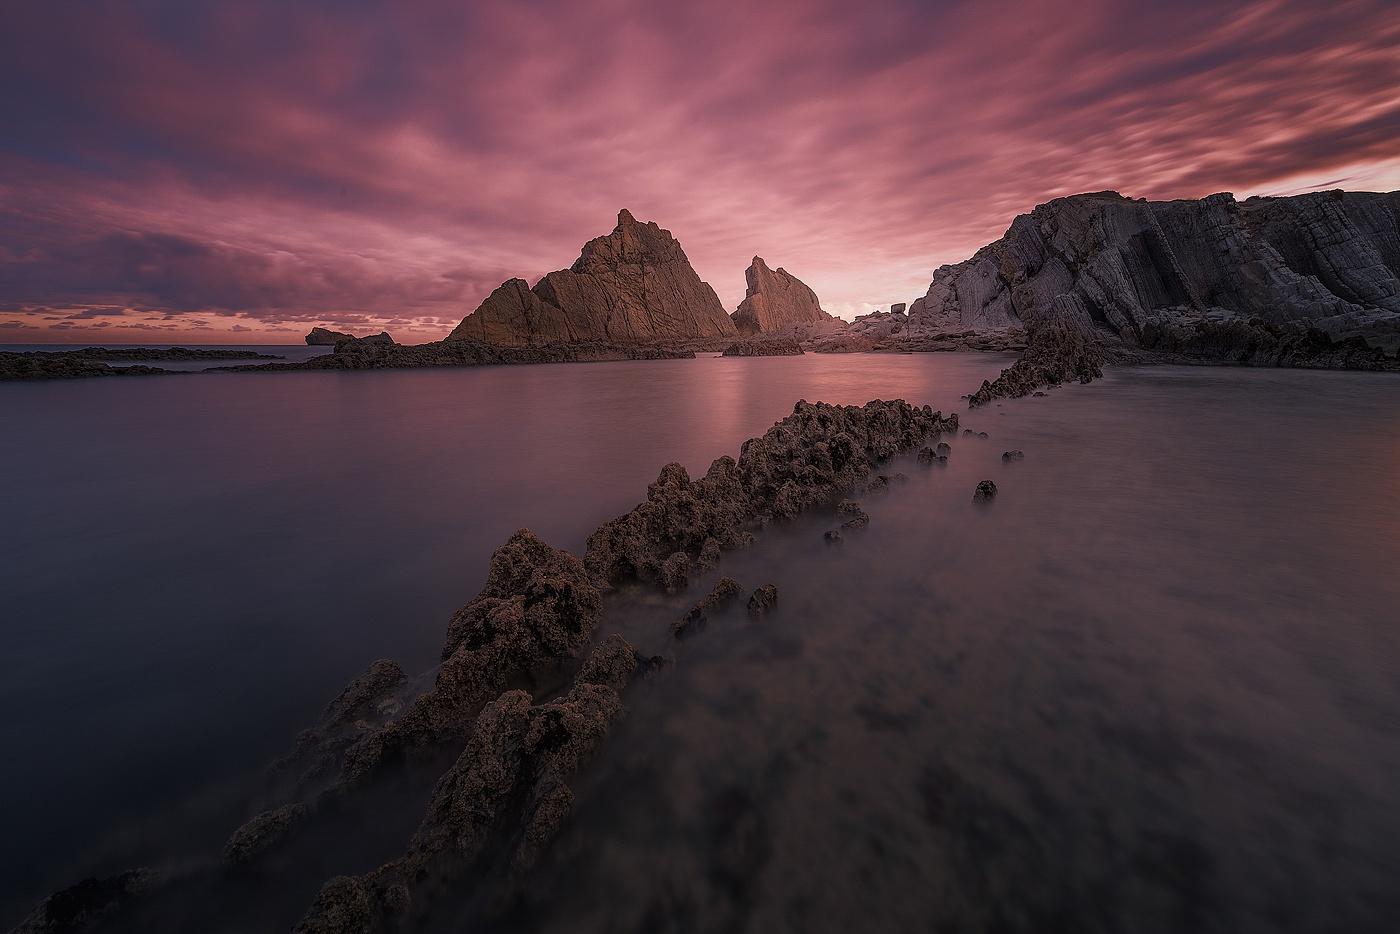 Sunrise rose by Juanj0